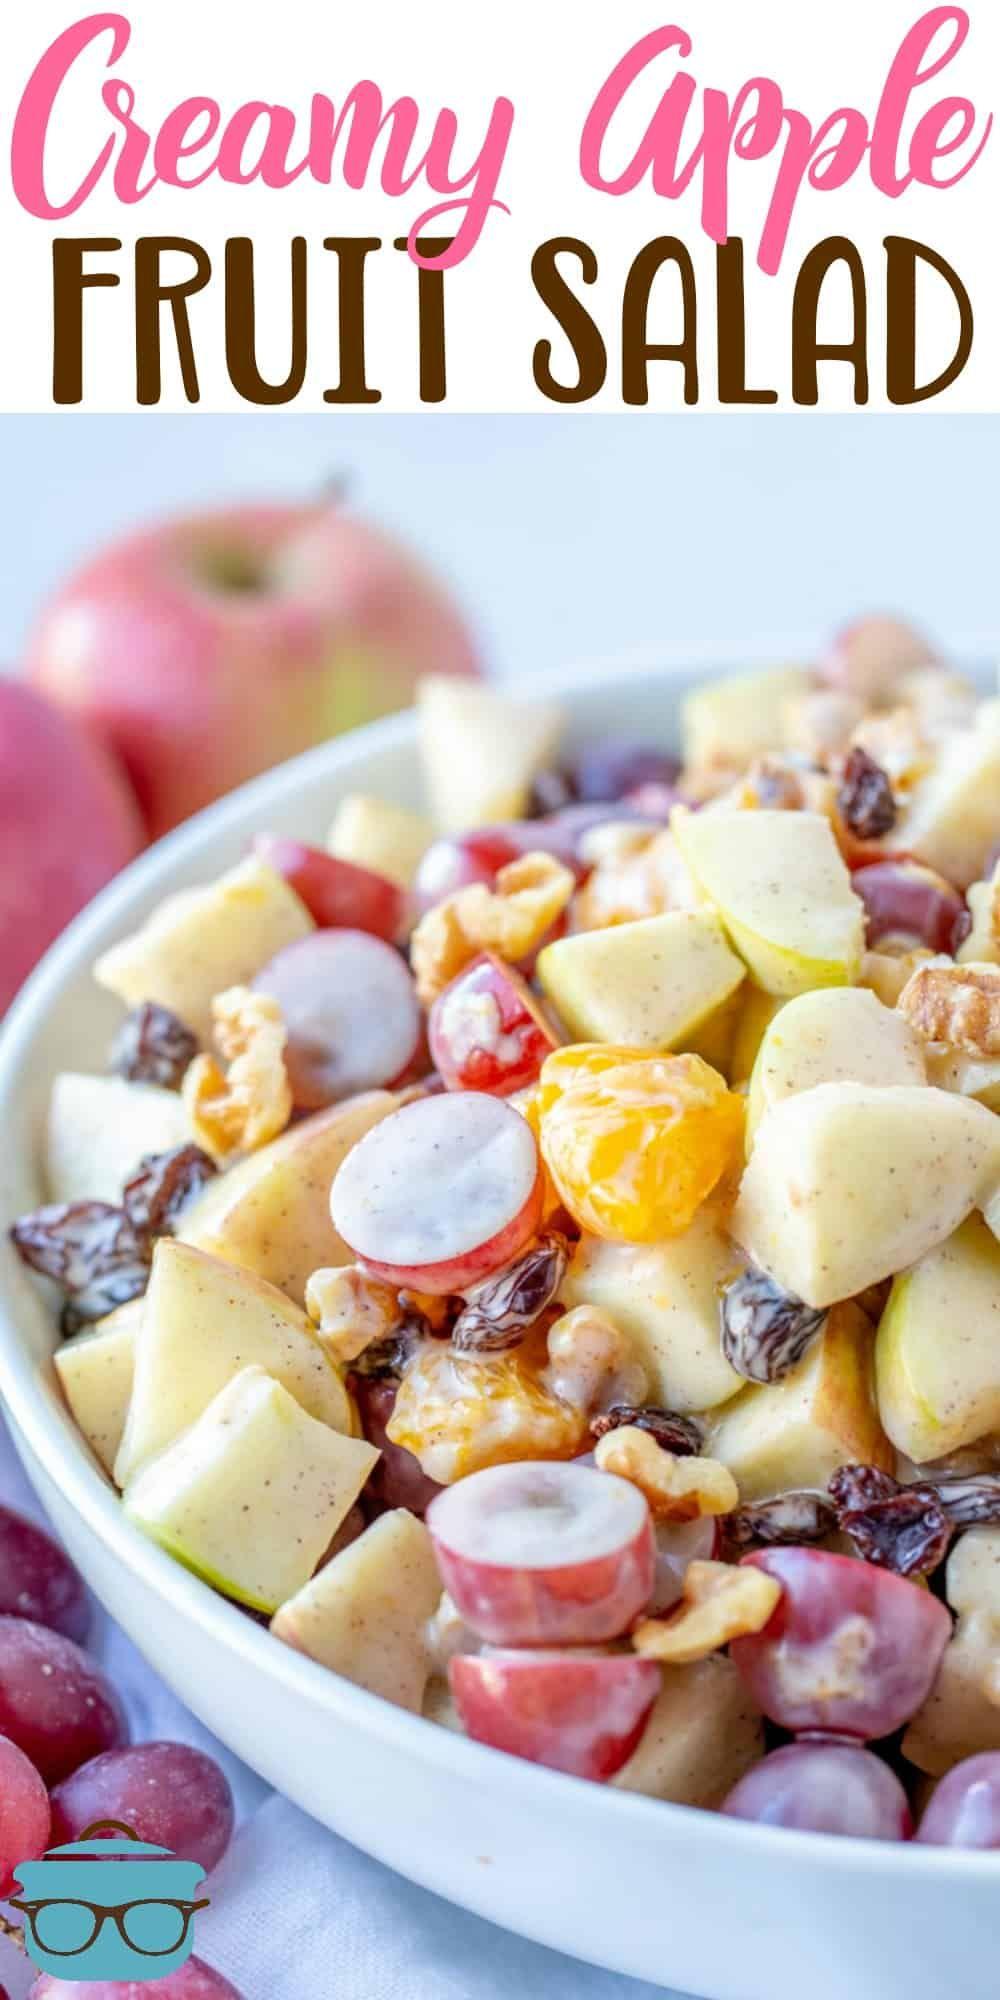 Apple Fruit Salad Video Recipe Easy Fruit Salad Recipes Fruit Salad Easy Fruit Salad Recipes